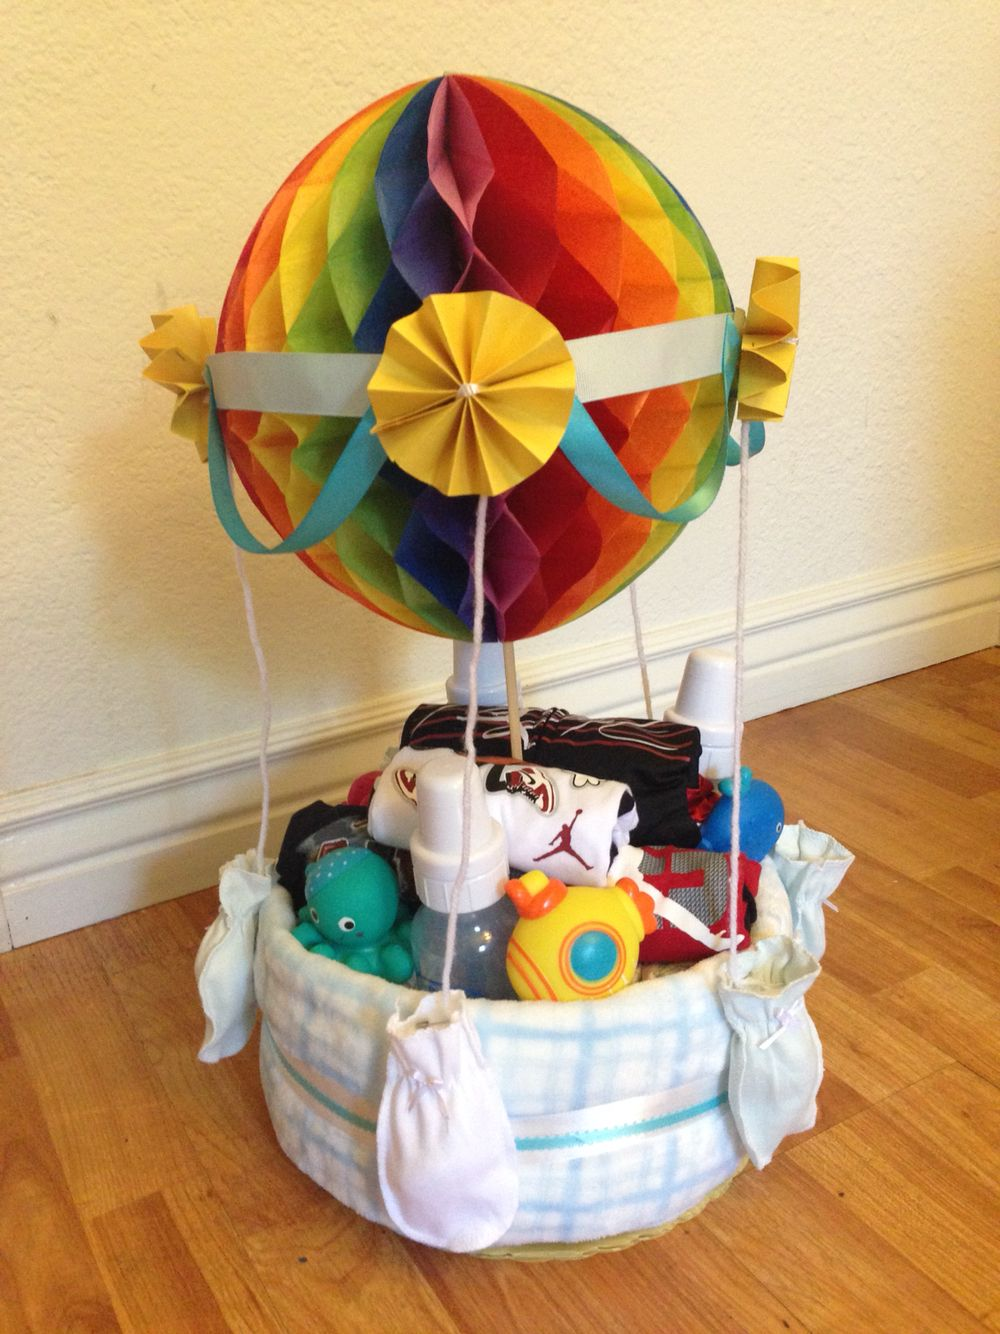 hot air balloon diaper cake my diy pinterest hot air balloons air balloon and diapers. Black Bedroom Furniture Sets. Home Design Ideas